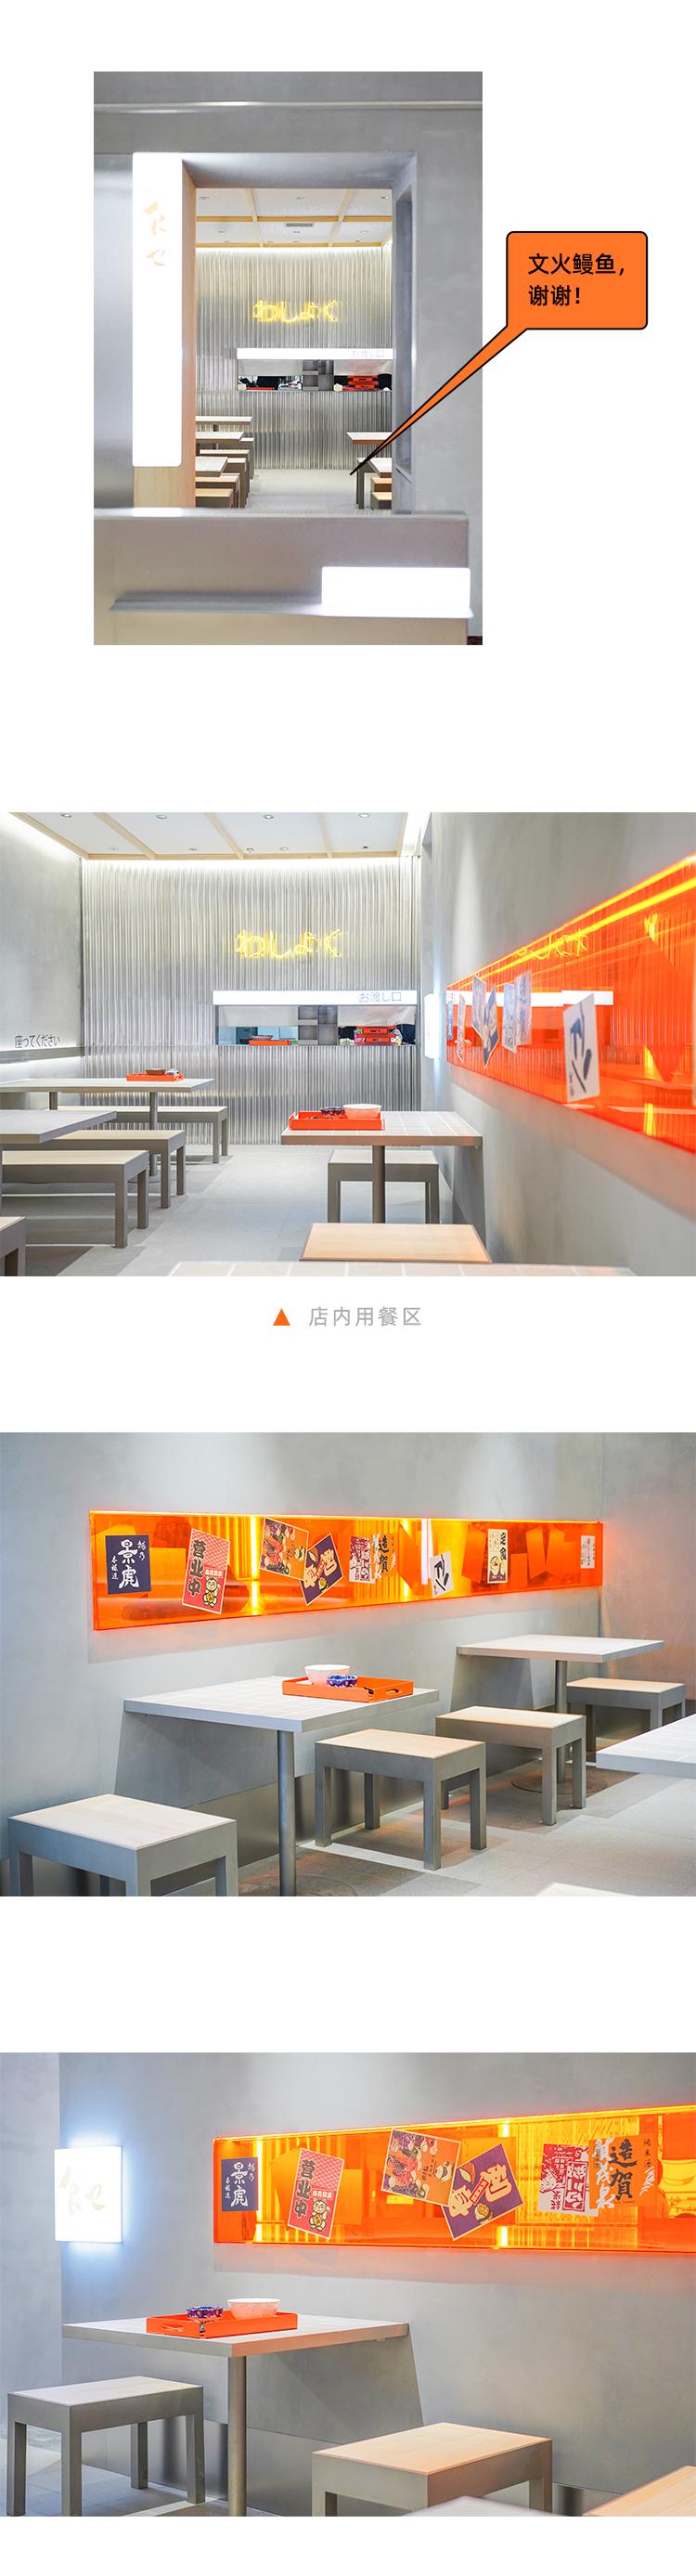 images-食也日料公众号推文_05